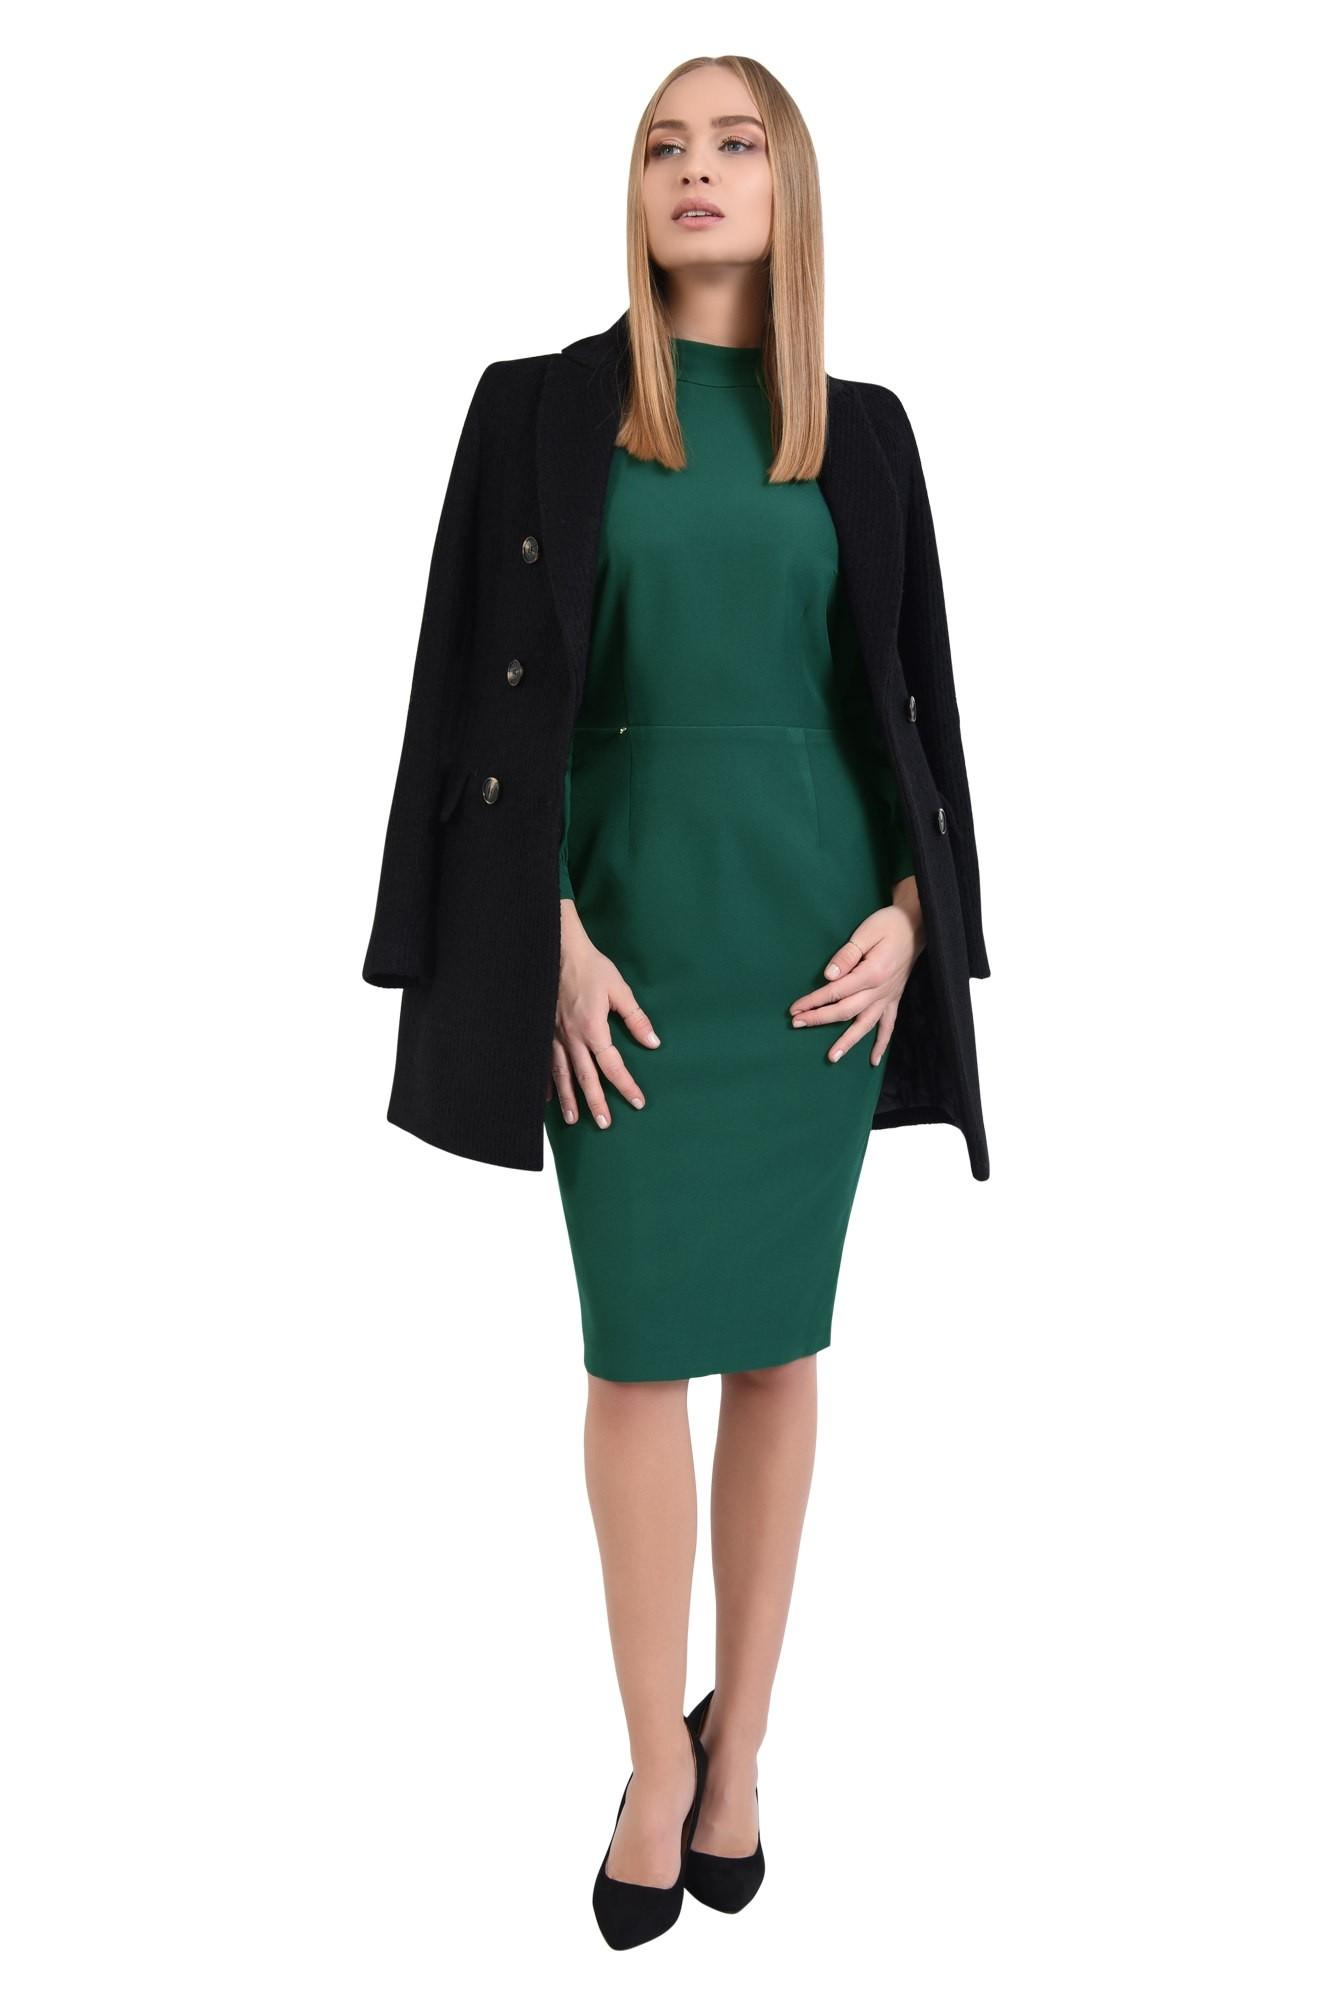 palton dama, online, negru, drept, doua randuri de nasturi